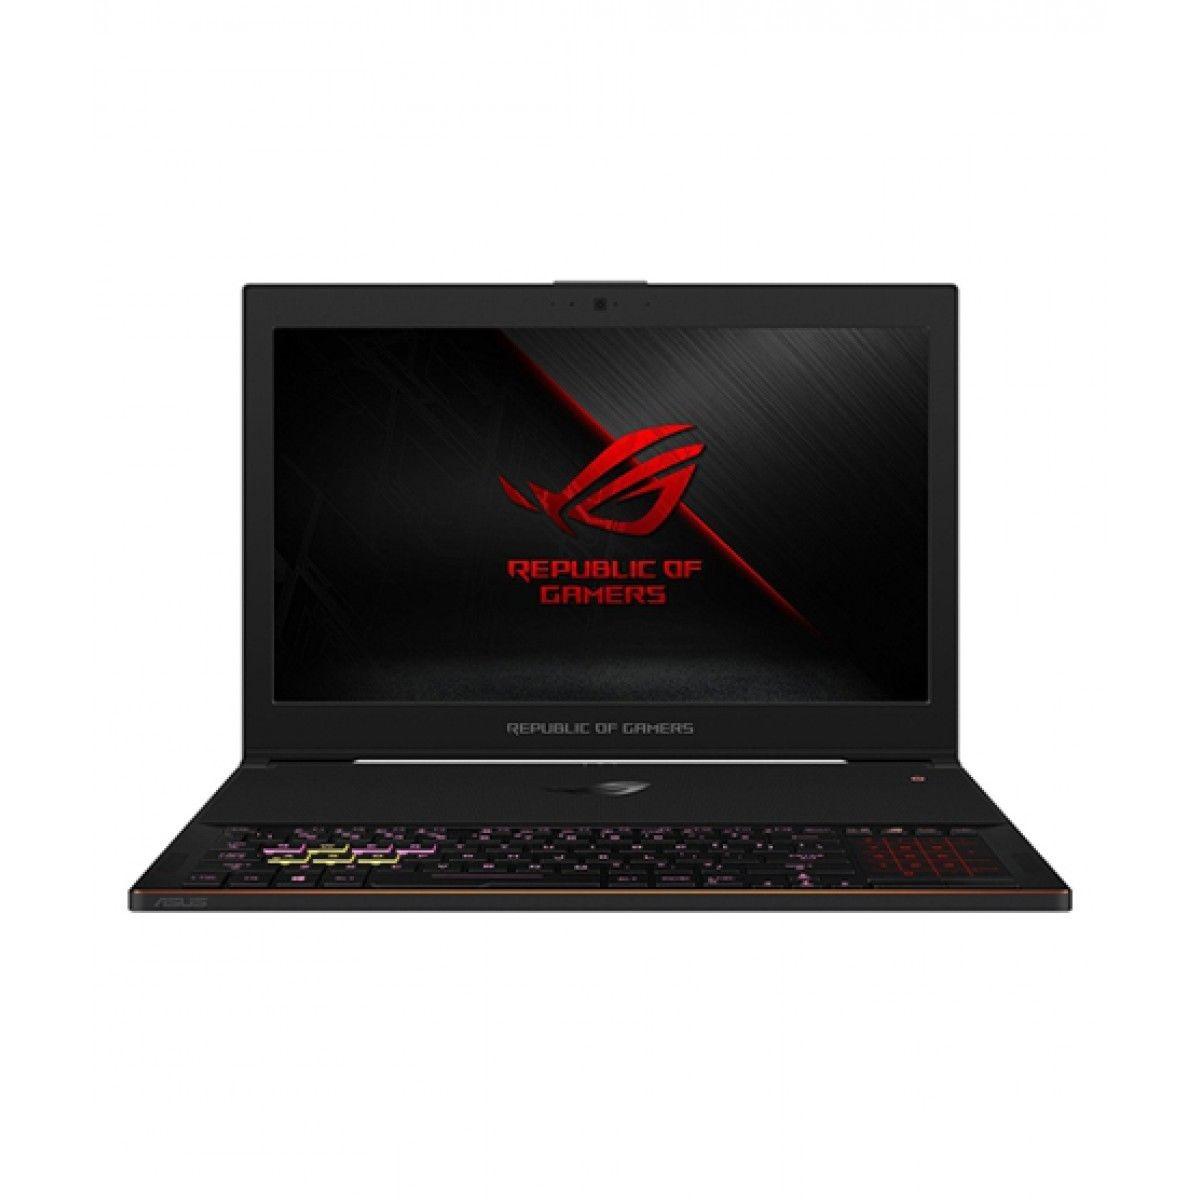 Asus GX501GI-XS74 15.6 Laptop Intel i7-8750H up to 4.10 GHz 16GB 512GB NVMe GTX 1080 8GB 144HZ G-SYNC for $1799.99 + FS